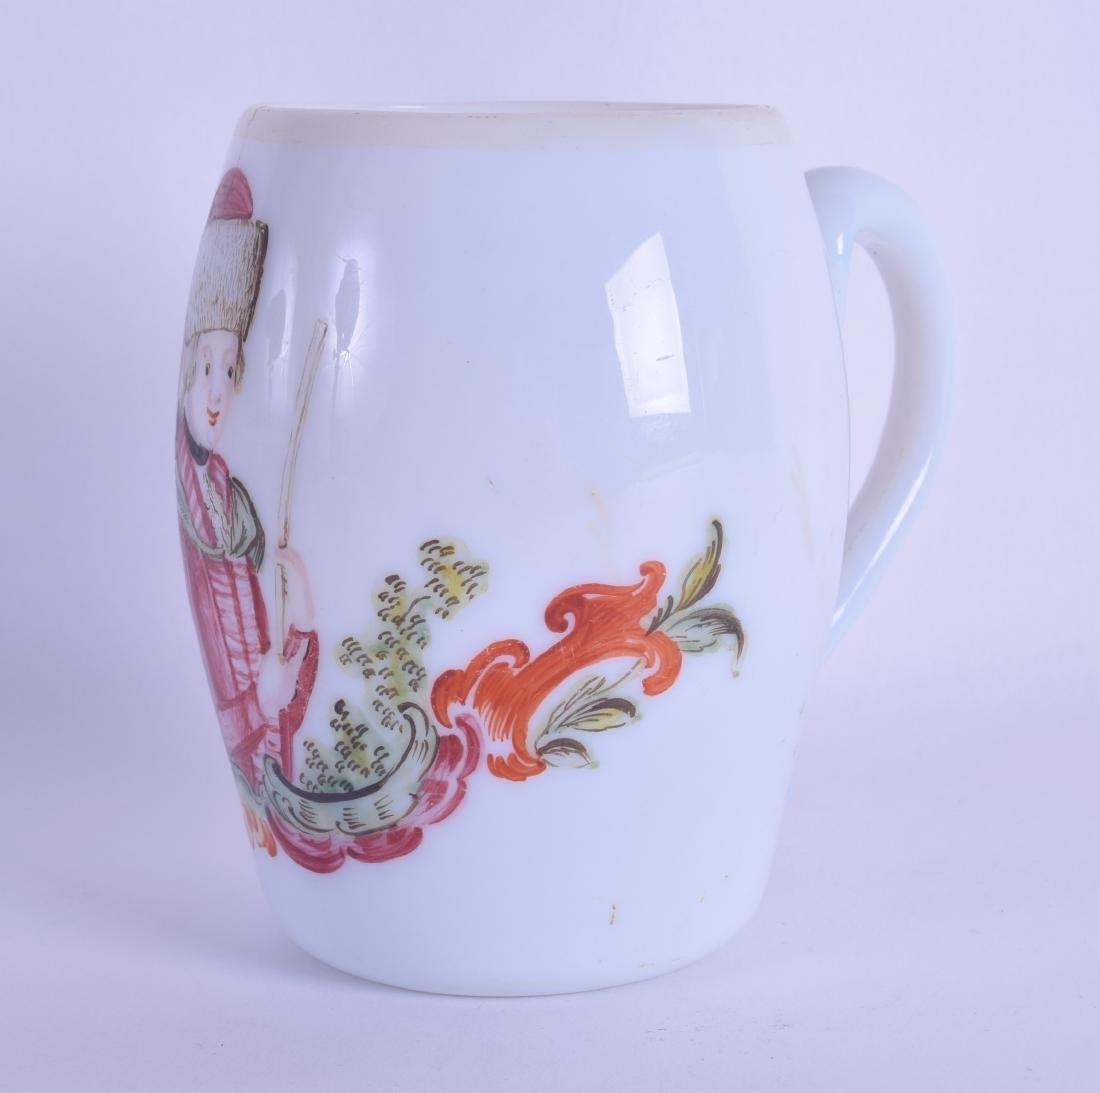 A RARE 18TH CENTURY BOHEMIAN MILK GLASS MUG painted